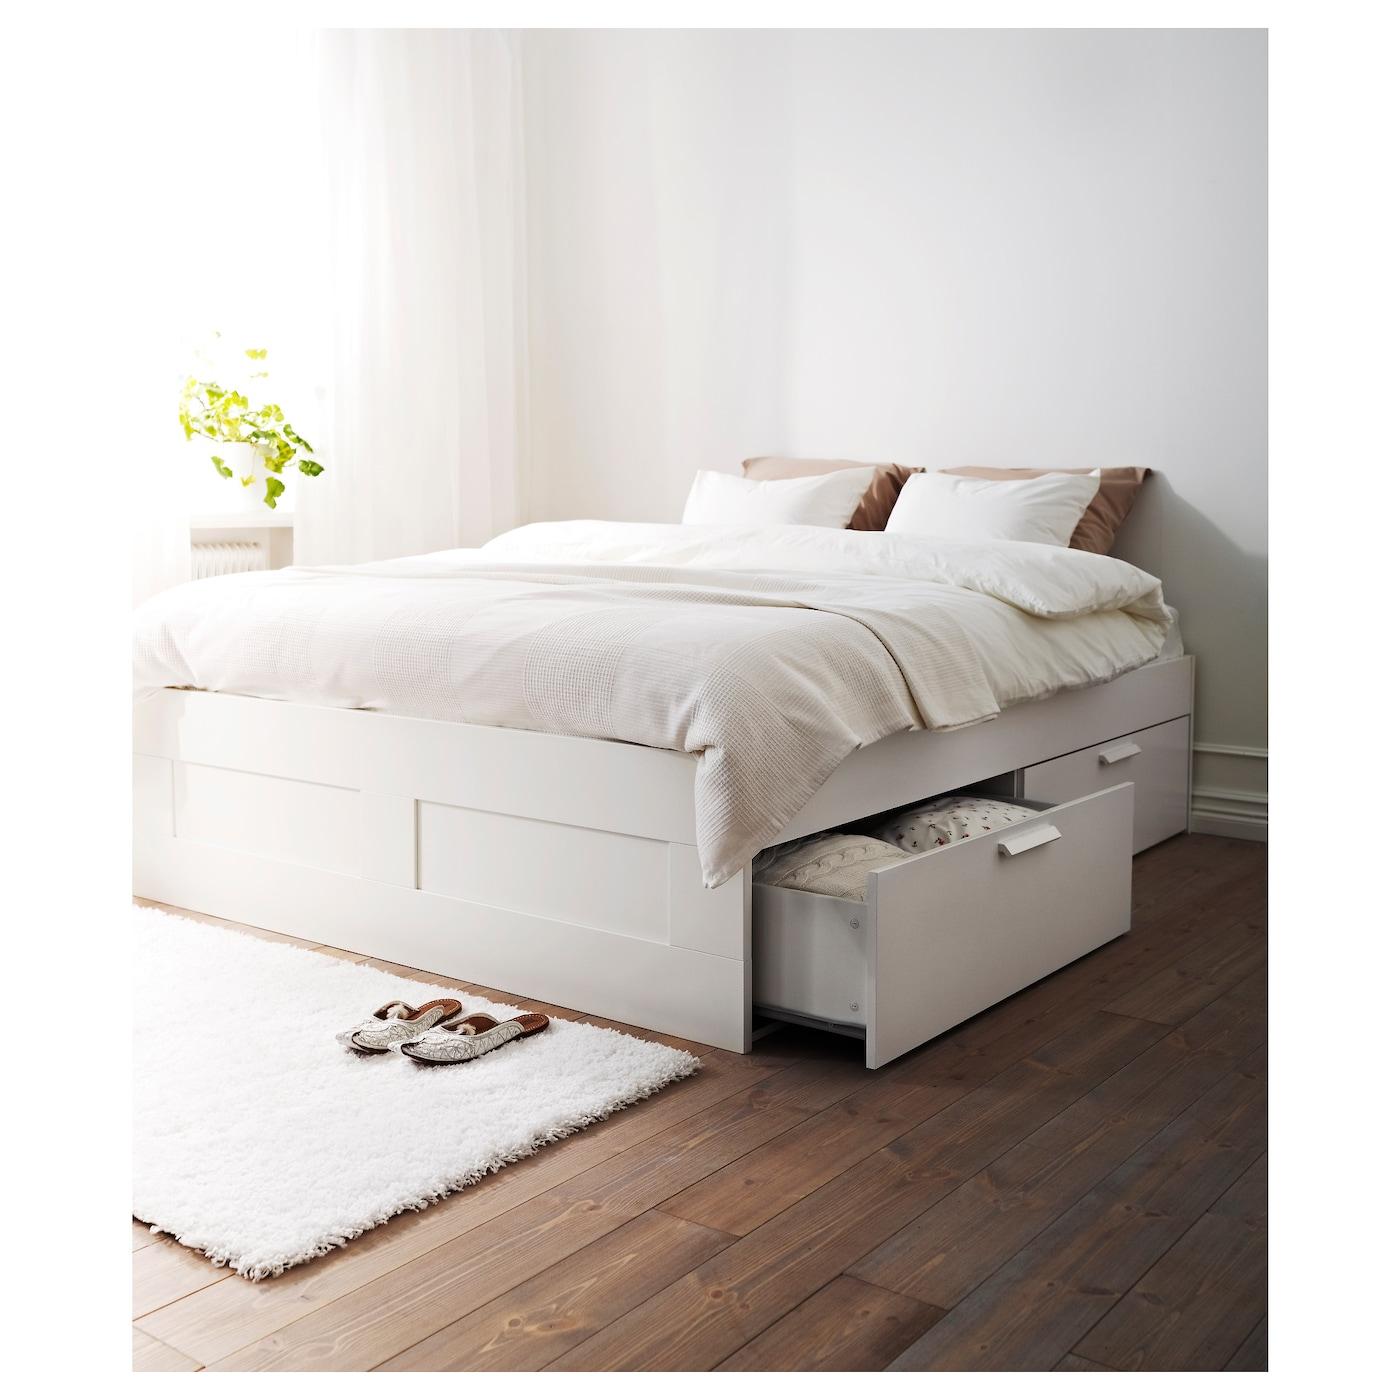 brimnes bed frame with storage white lur y 180x200 cm ikea. Black Bedroom Furniture Sets. Home Design Ideas